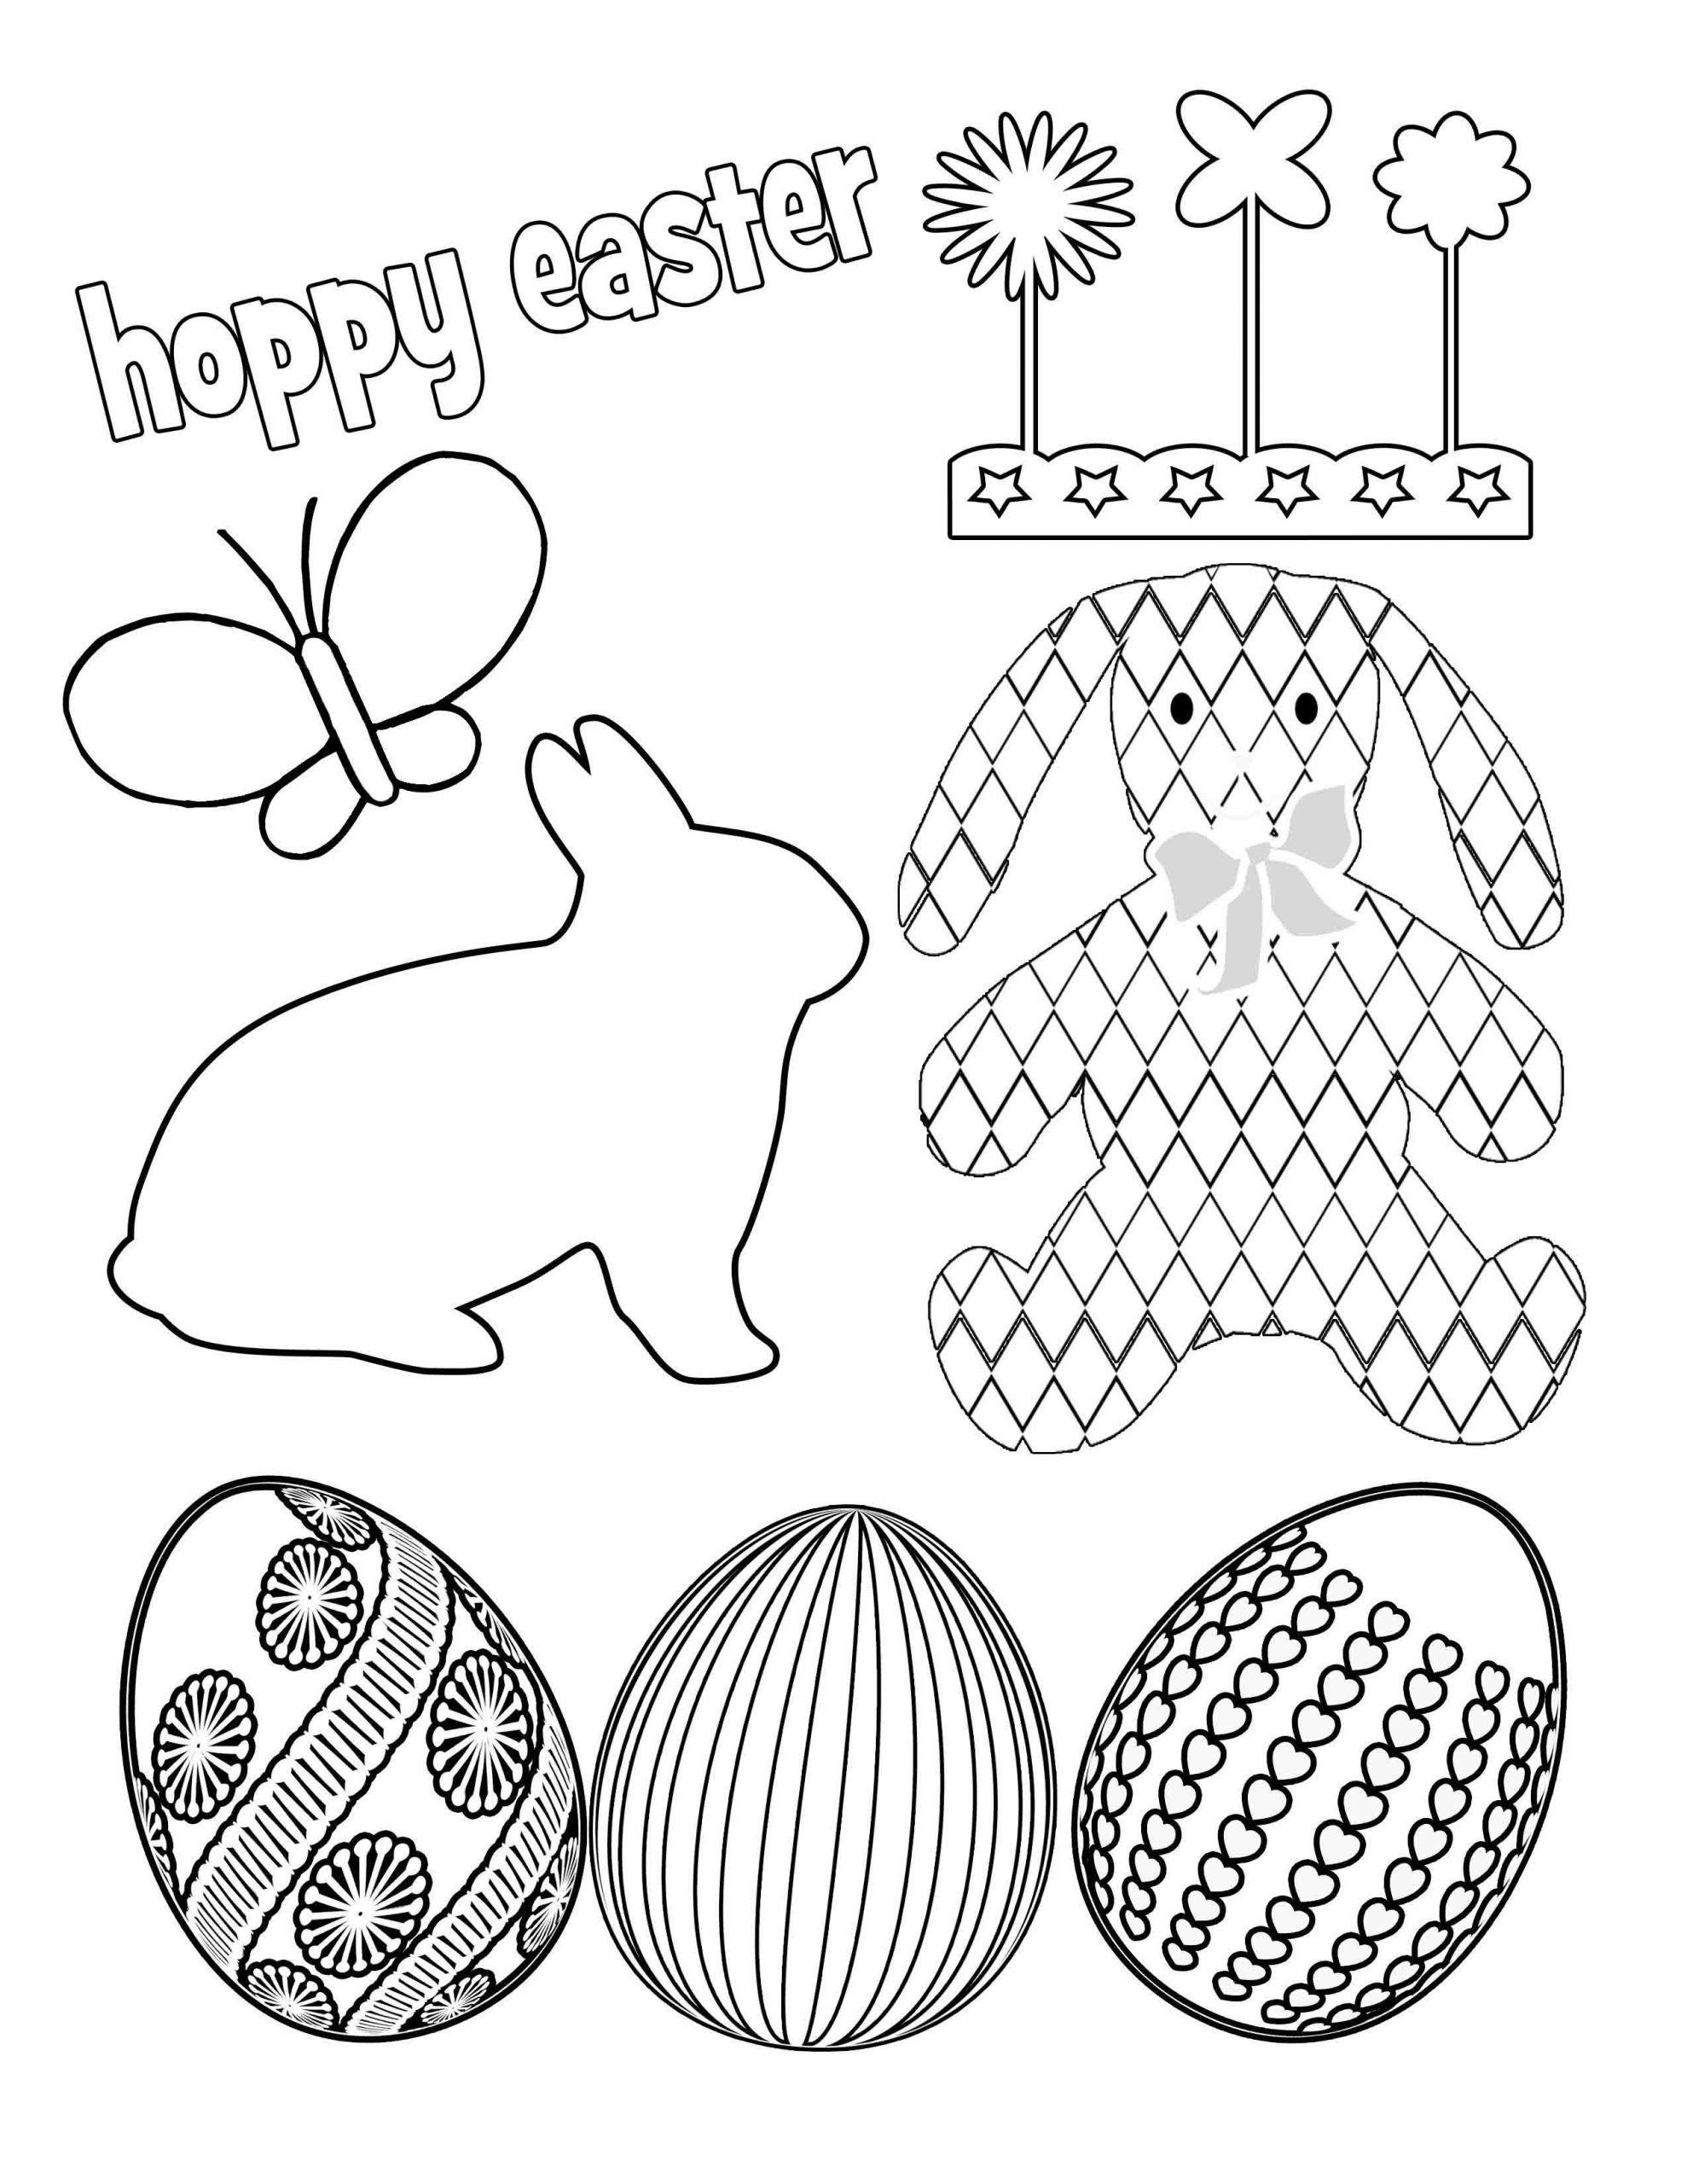 7 Forest Animals Preschool Worksheets Easterring For Kids